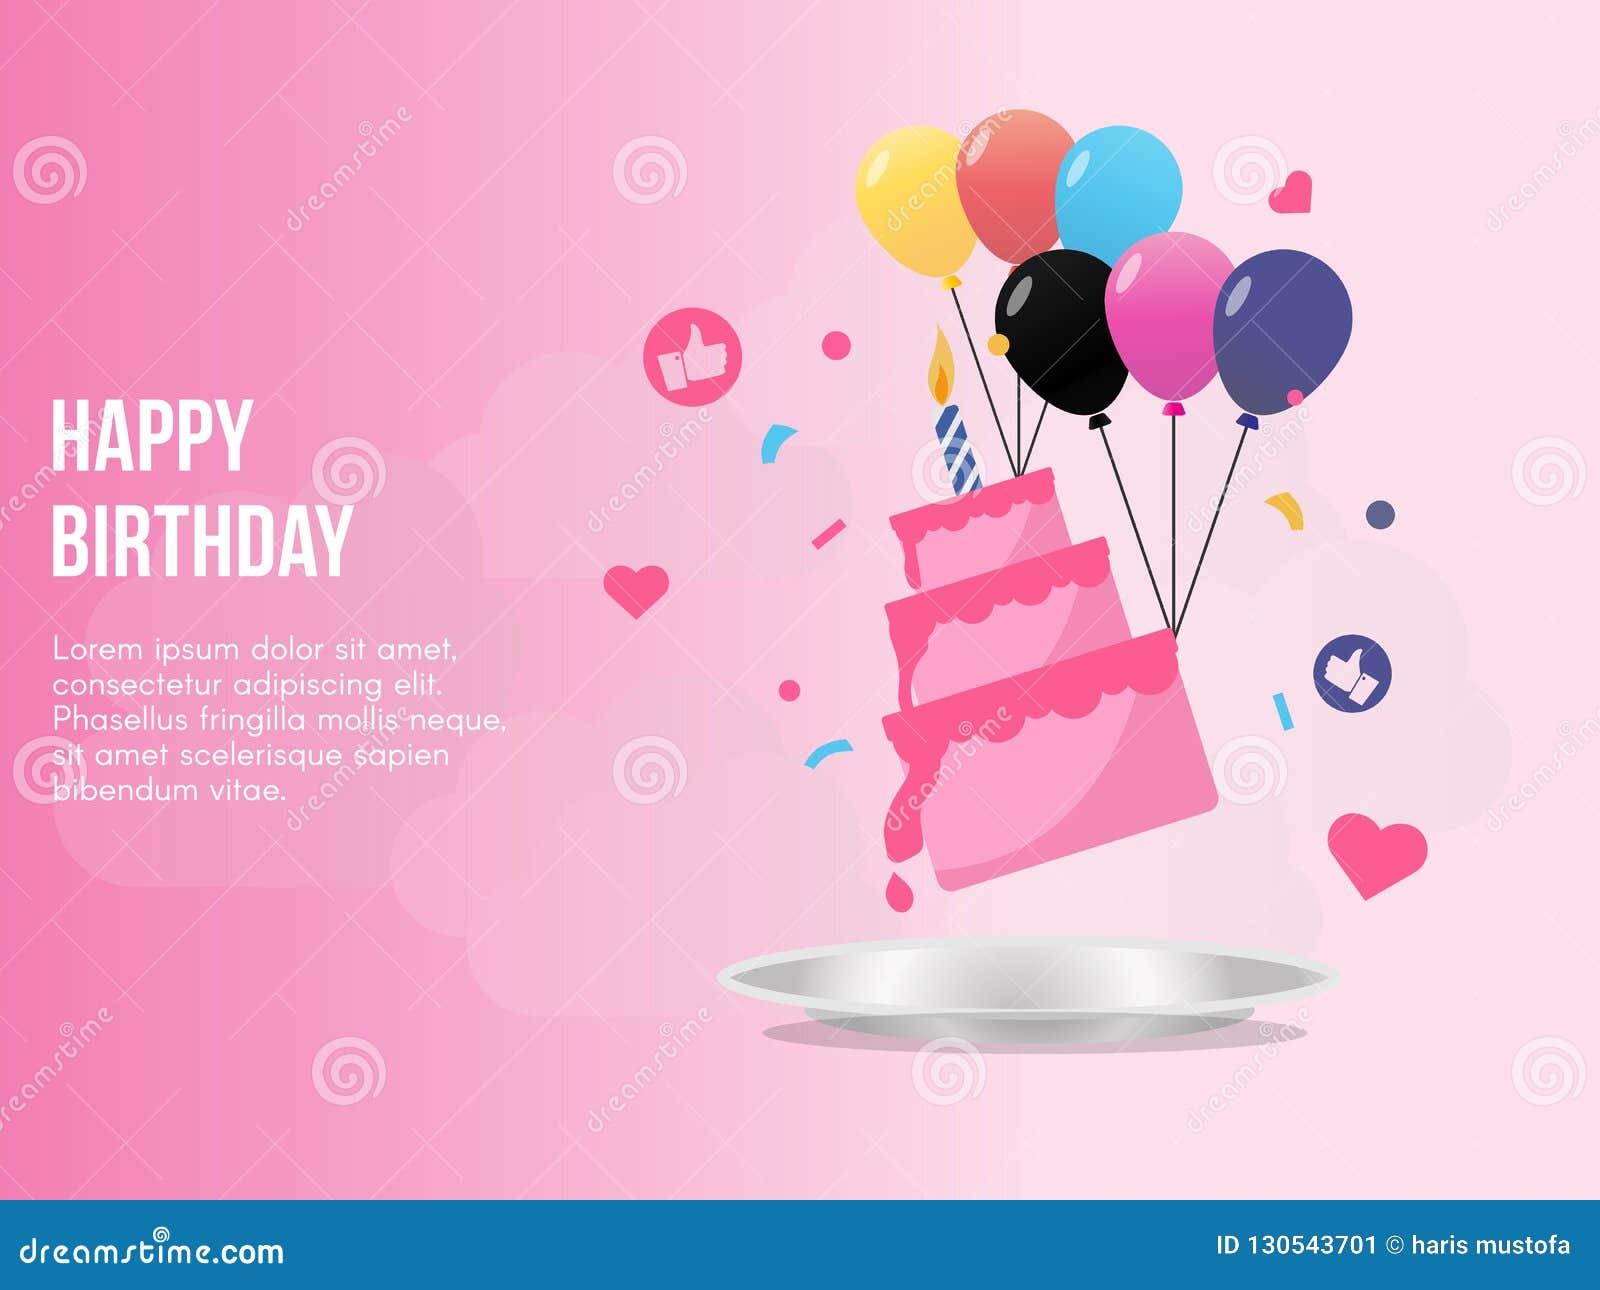 Happy Birthday Concept Illustration Vector Design Template